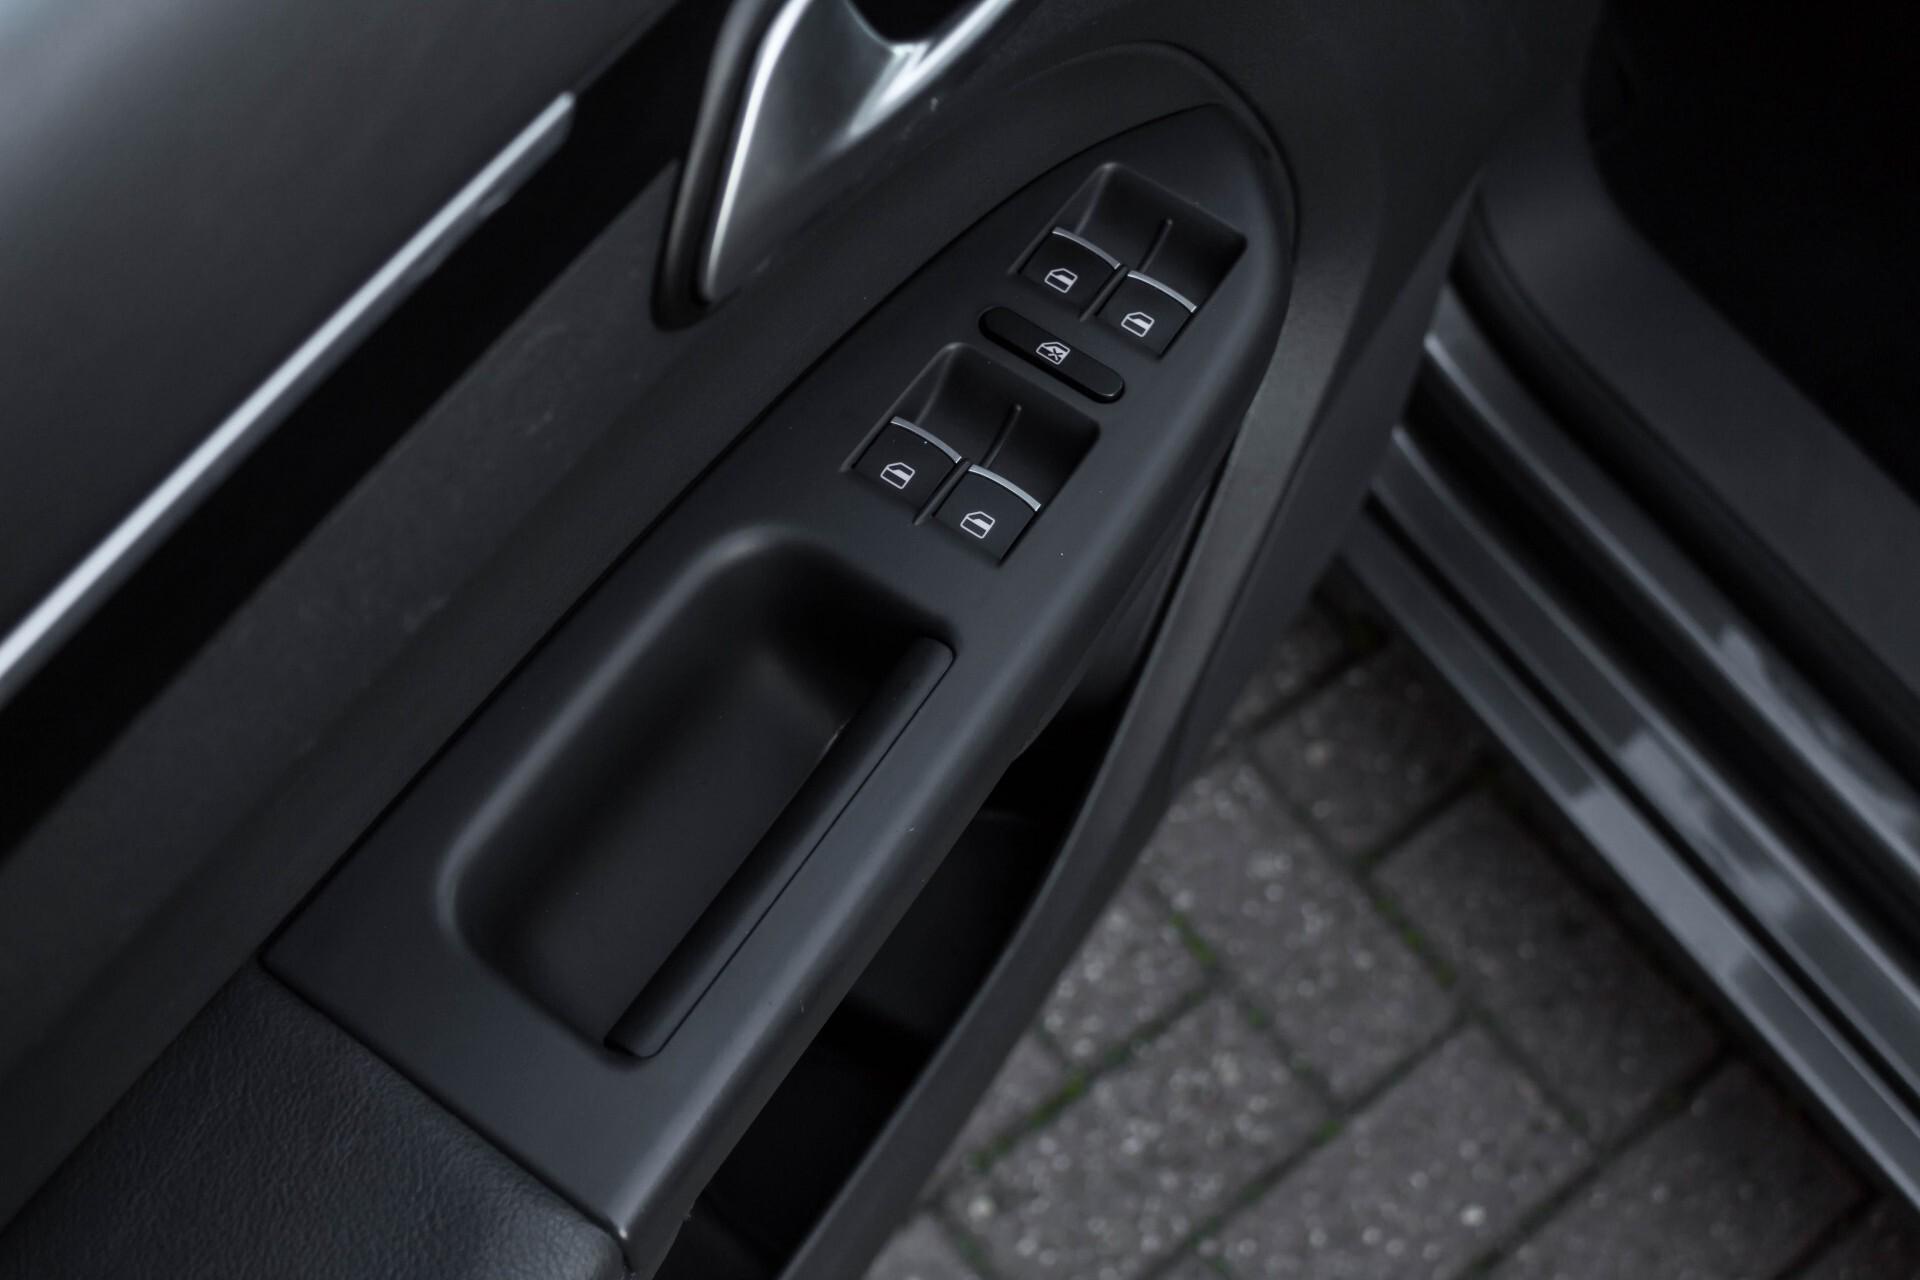 Volkswagen Touran 2.0 TDI Highline 7Persoons 177pk Panorama/Leder/Navi/Camera/Verw-Stln/Trhk/ECC/Xenon Aut Foto 33